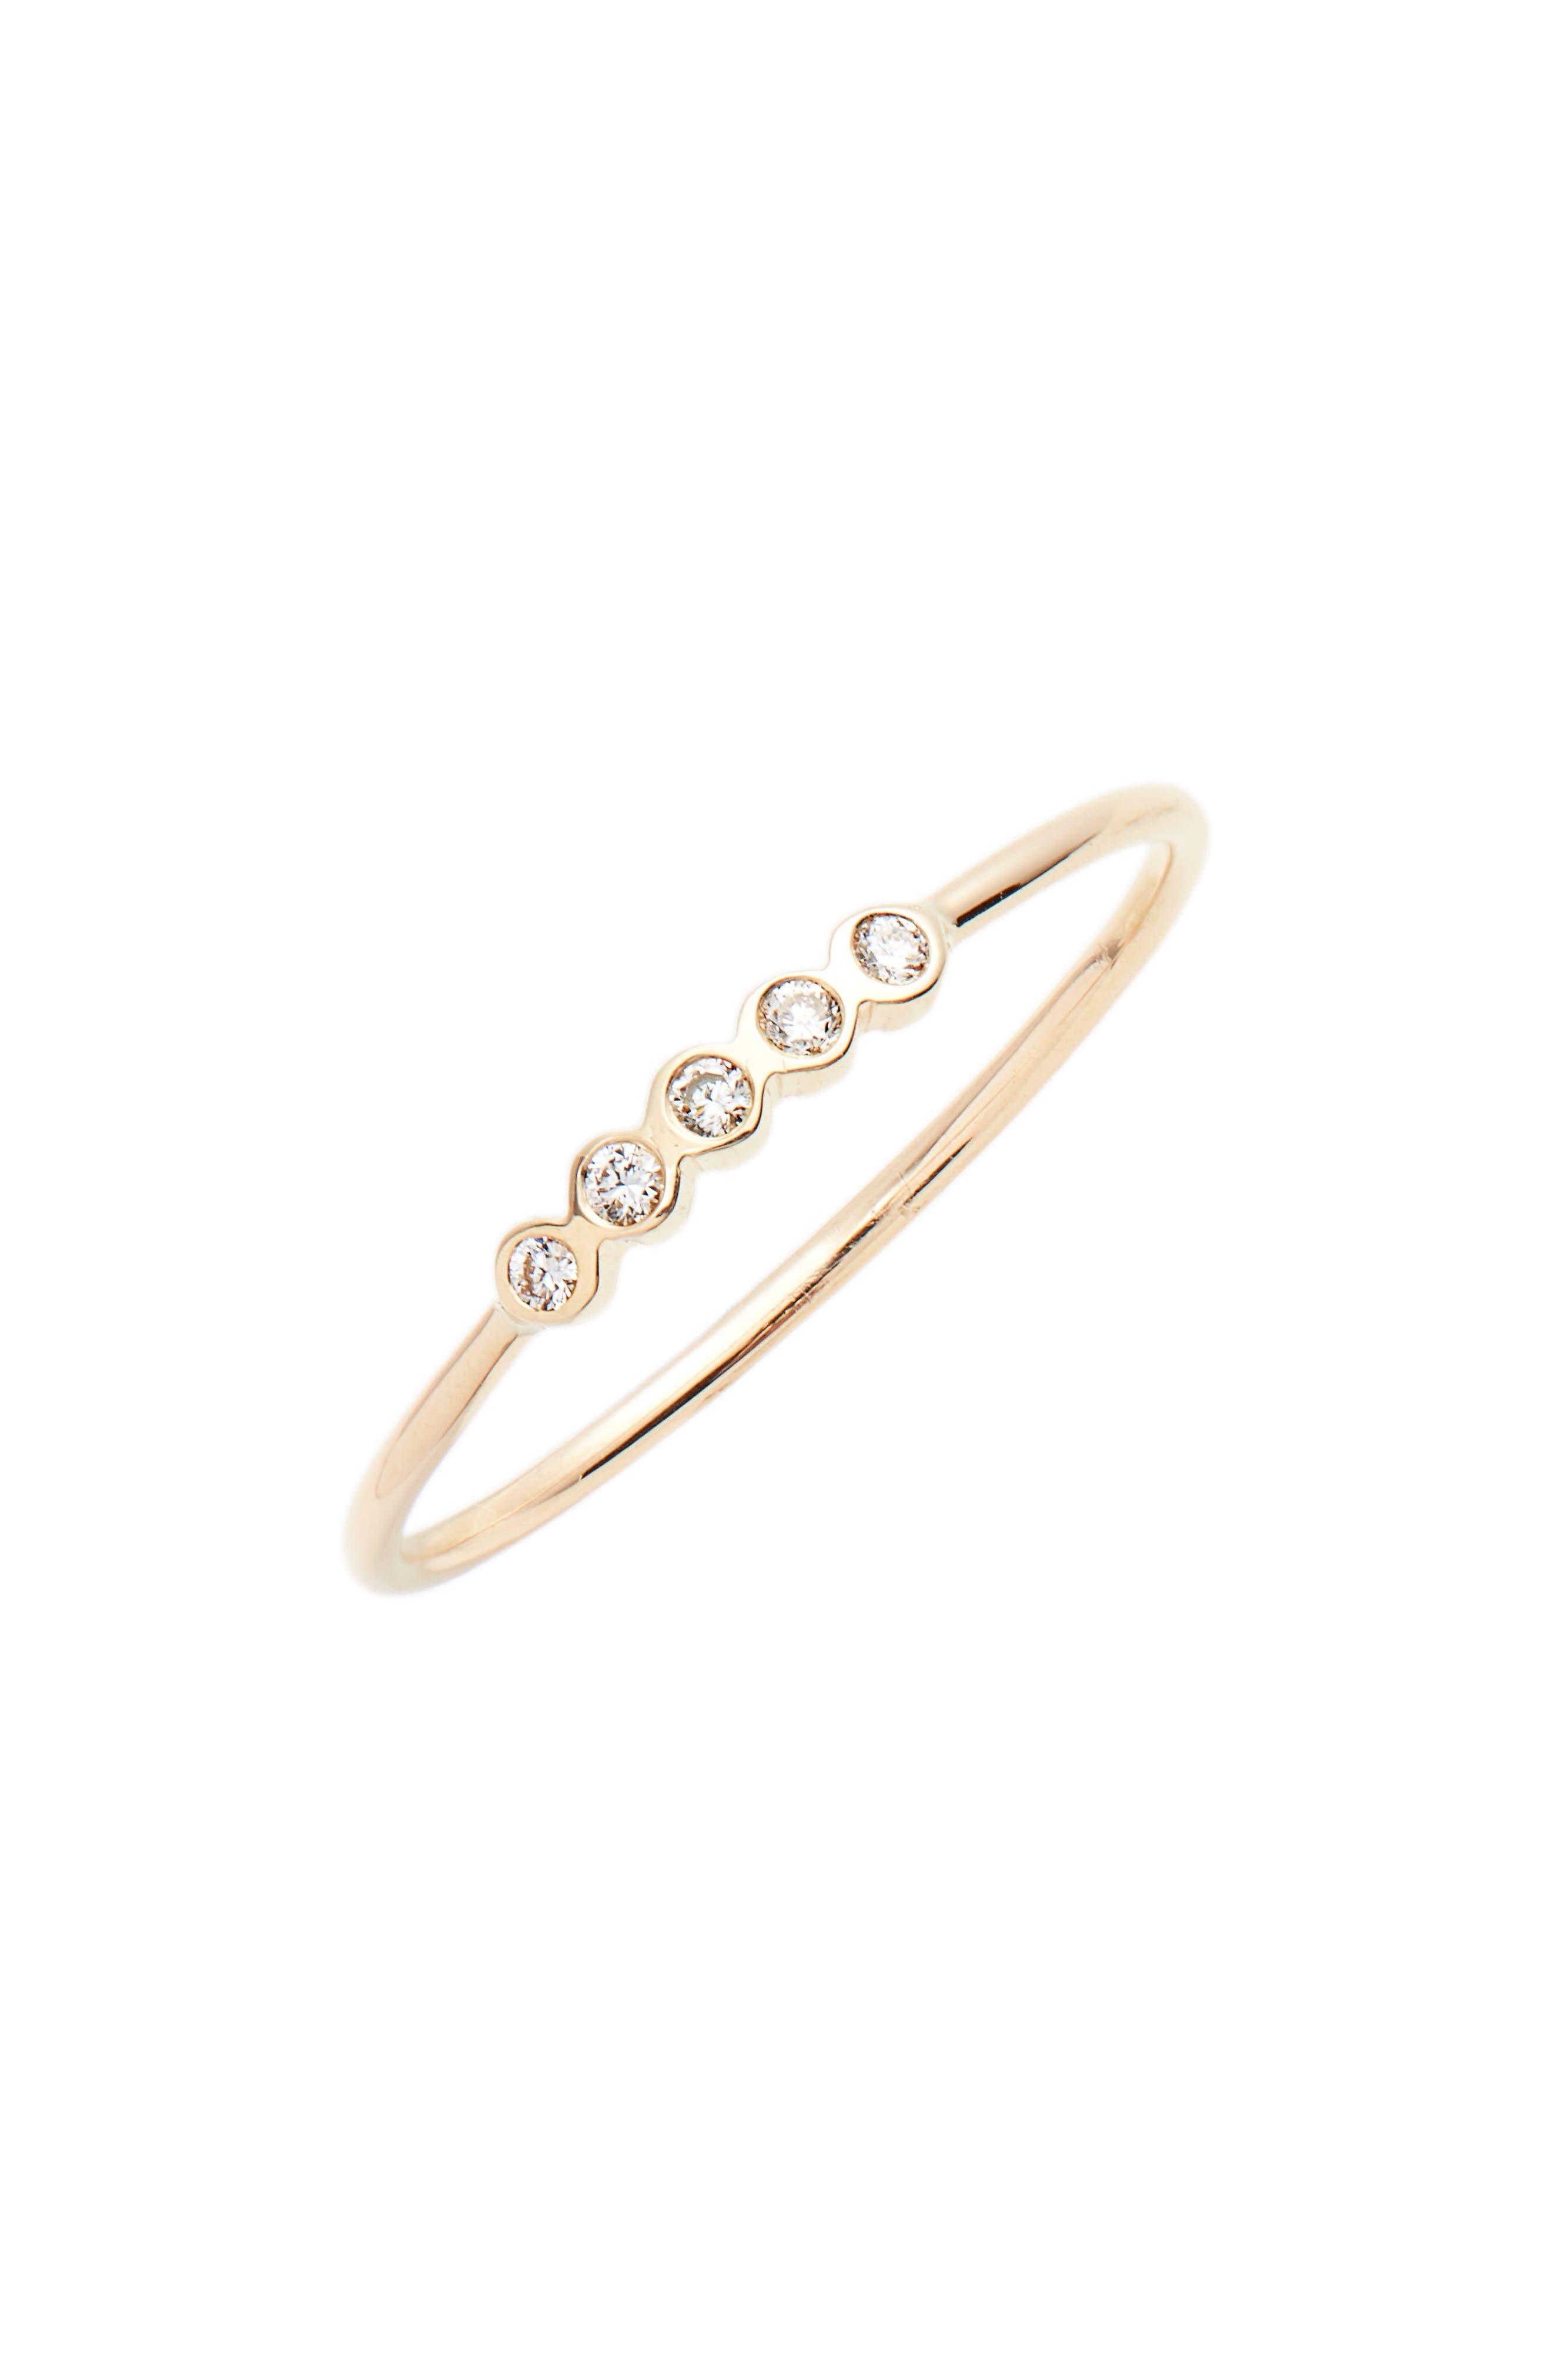 5-Diamond Bezel Stock Ring,                         Main,                         color, Yellow Gold